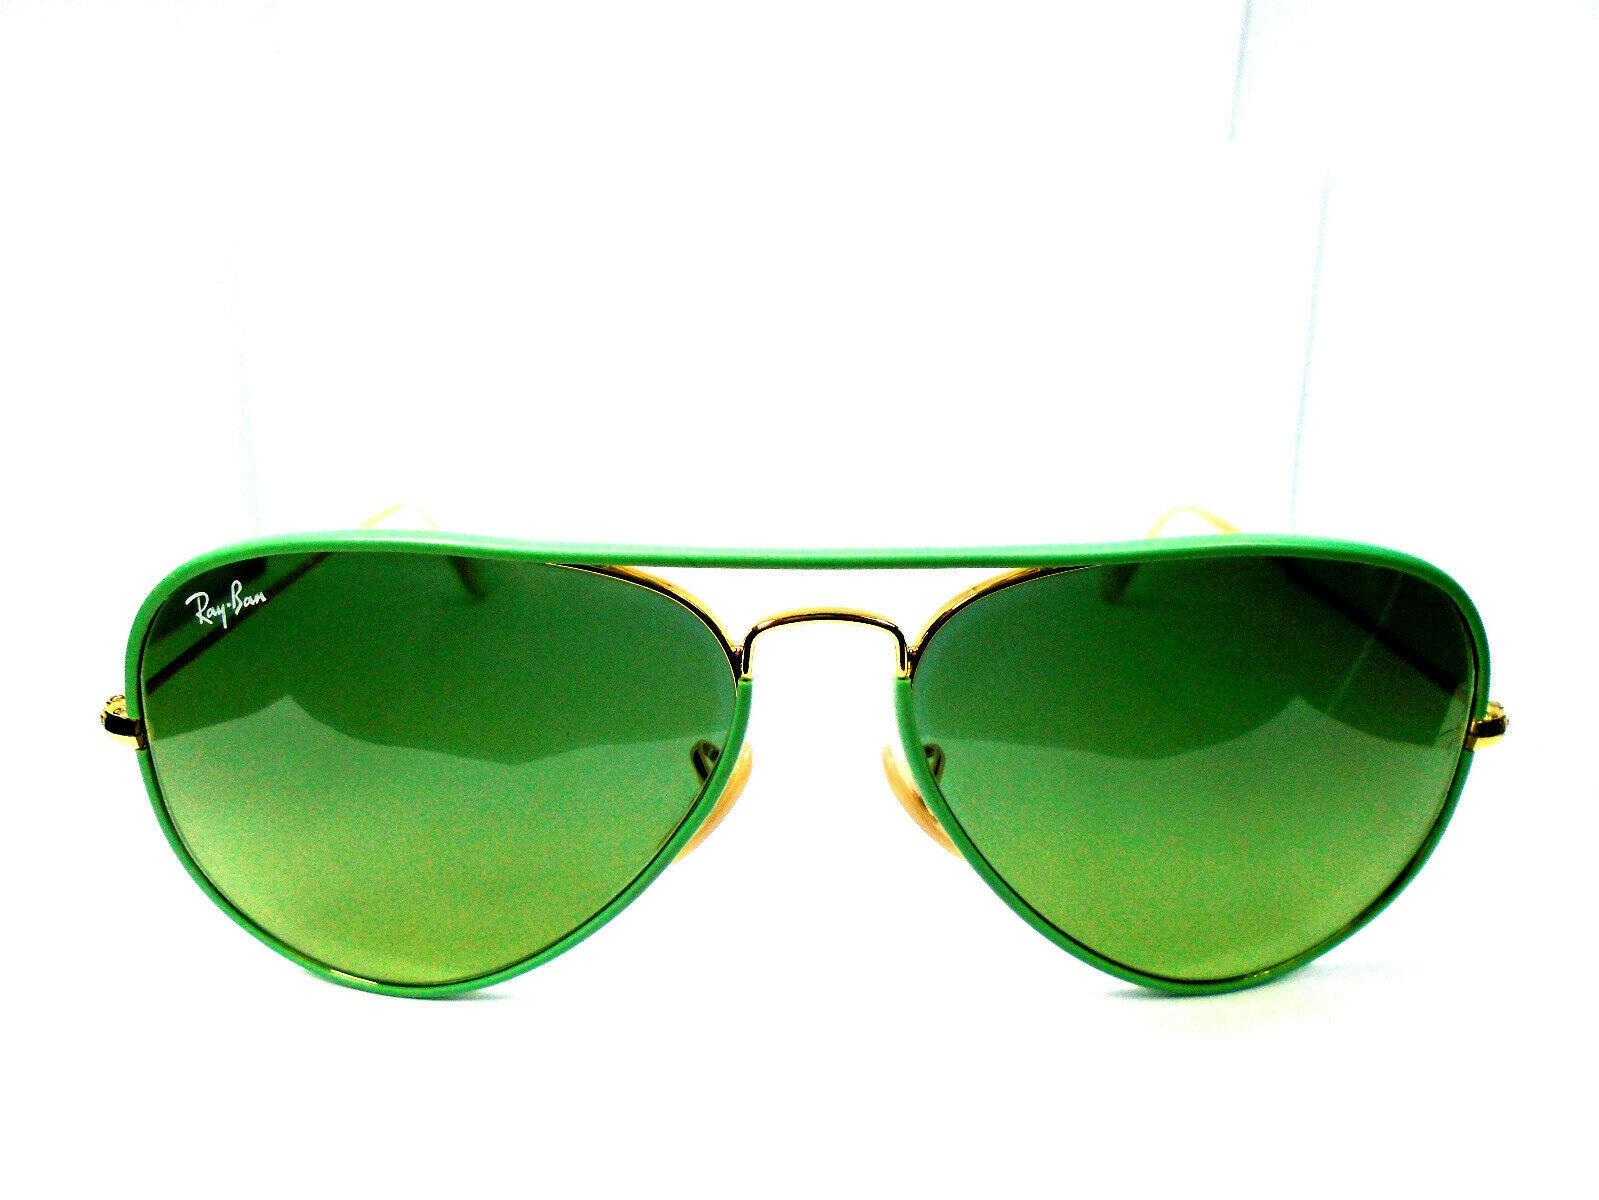 Ray-Ban RB 3025-J-M Aviator Full Color 001/3M Green/Gold 58-14 Sunglasses - $79.99